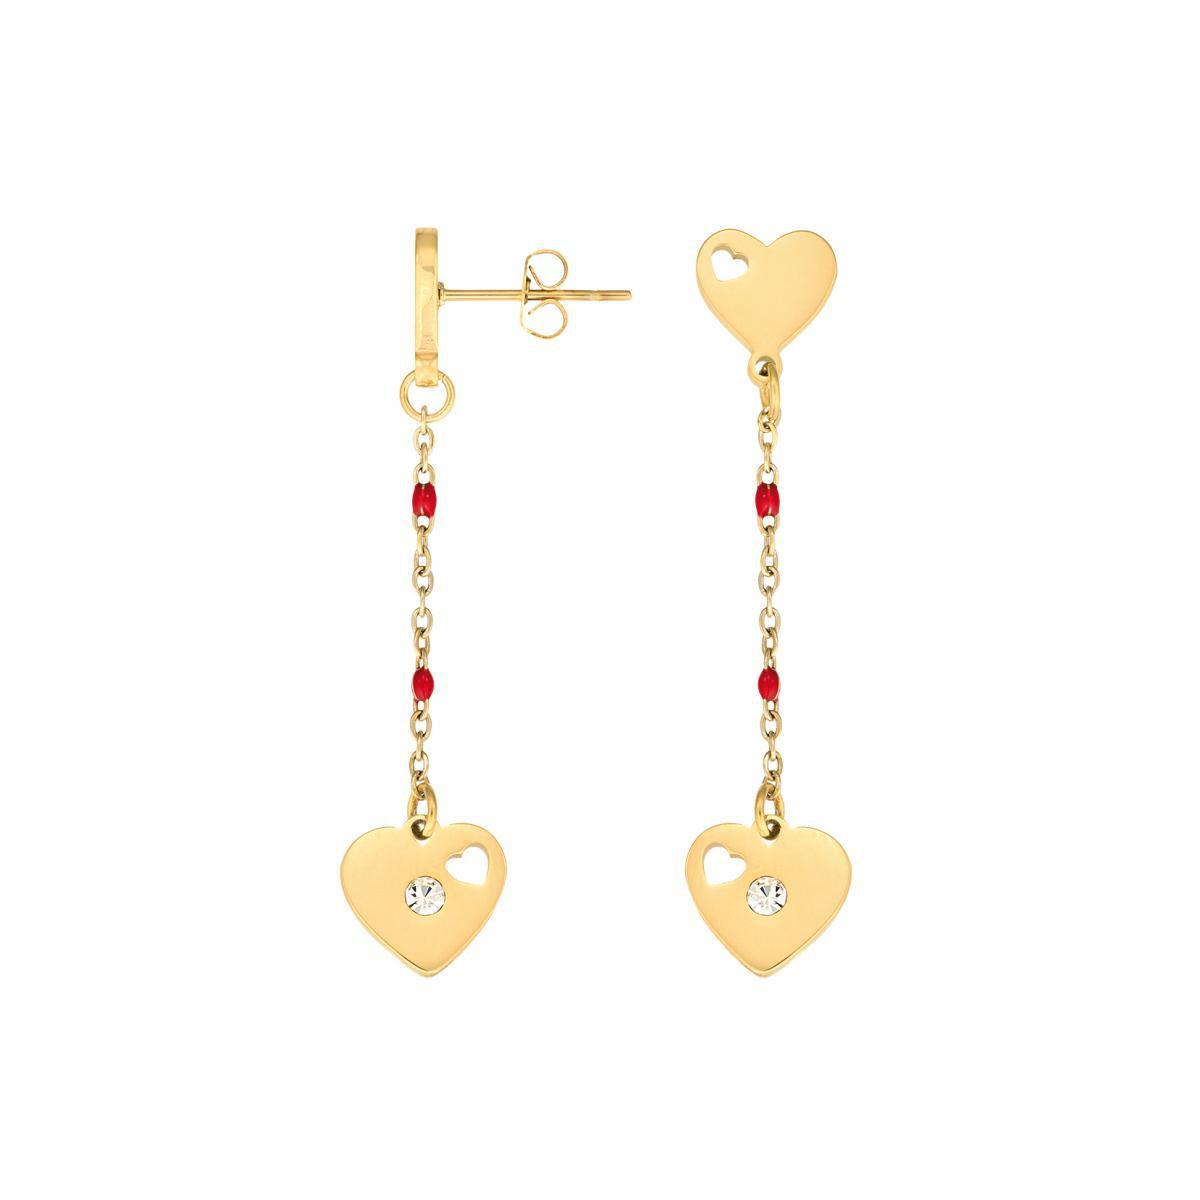 Boucles d'oreilles Bijoux 608087 - Go Mademoiselle - Modalova